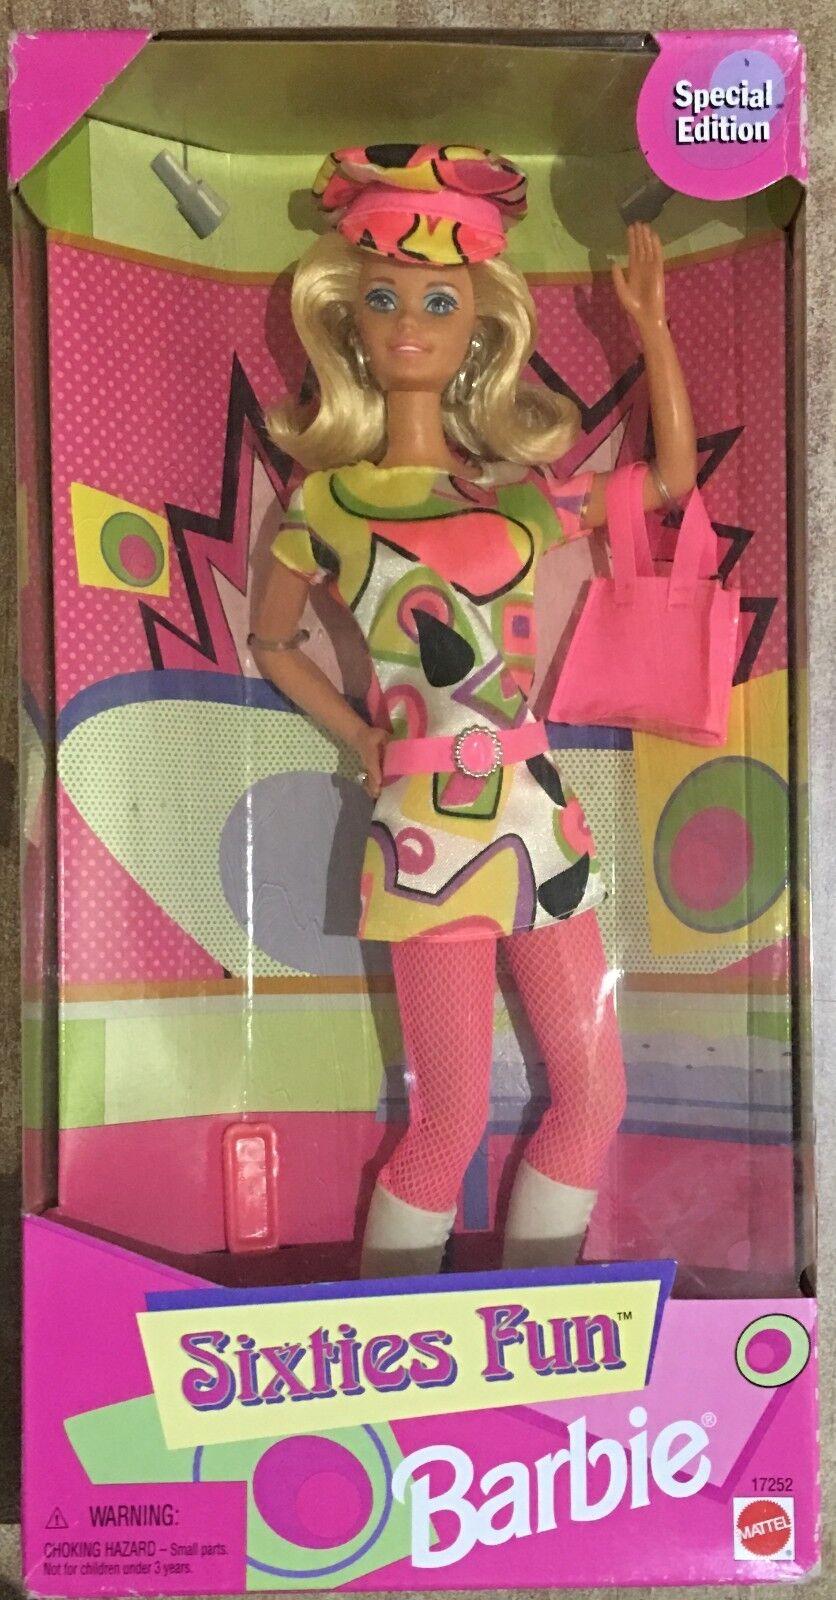 Barbie Barbie Barbie Mattel Sam's Club Sixties Fun 60'S Vintage 97' 183f57